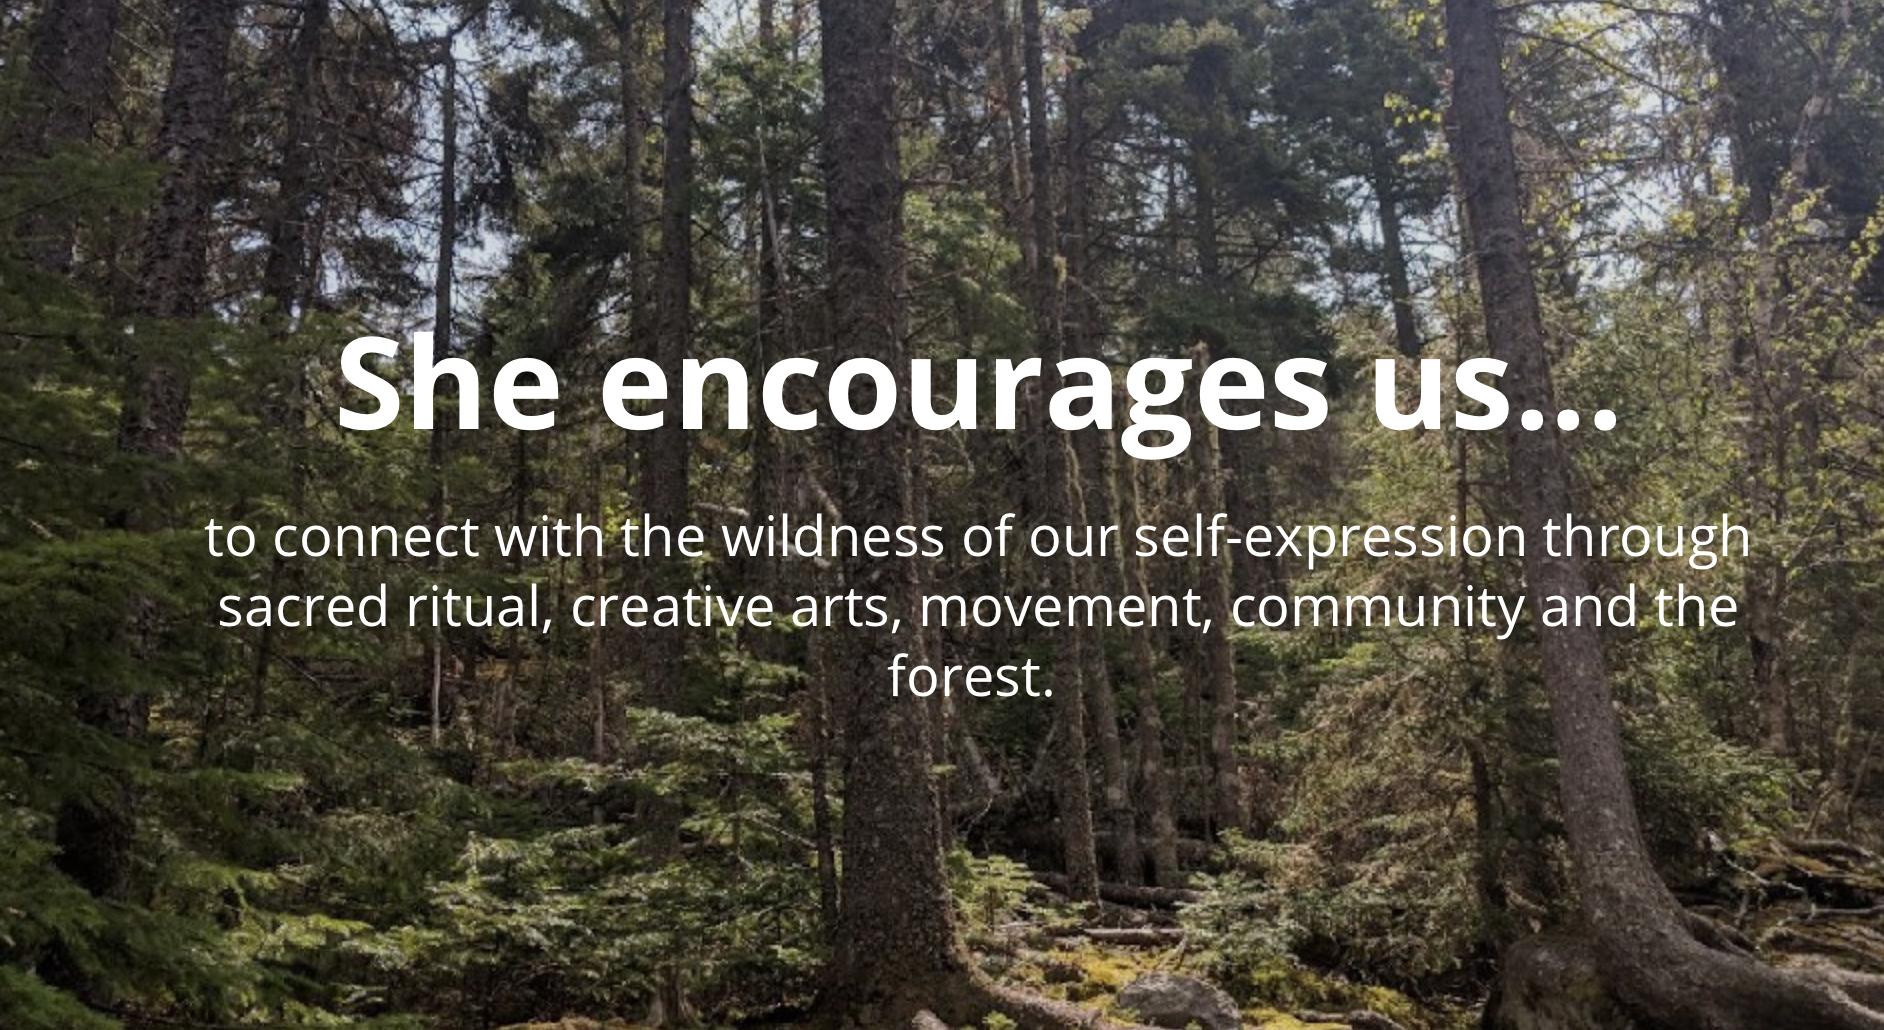 Encourage.jpg